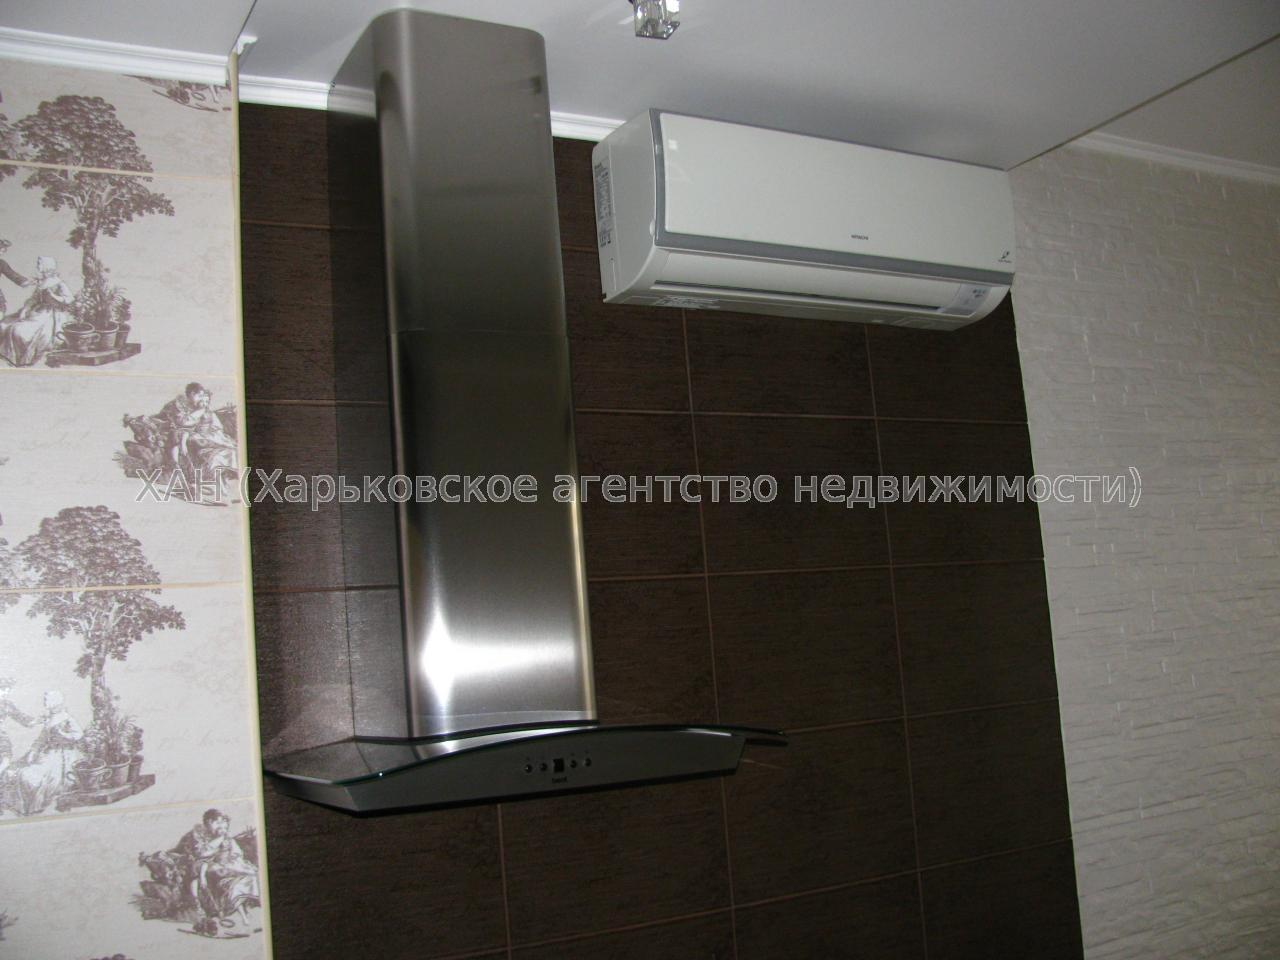 Фото 2 - Продам квартиру Харьков, Отакара Яроша ул.